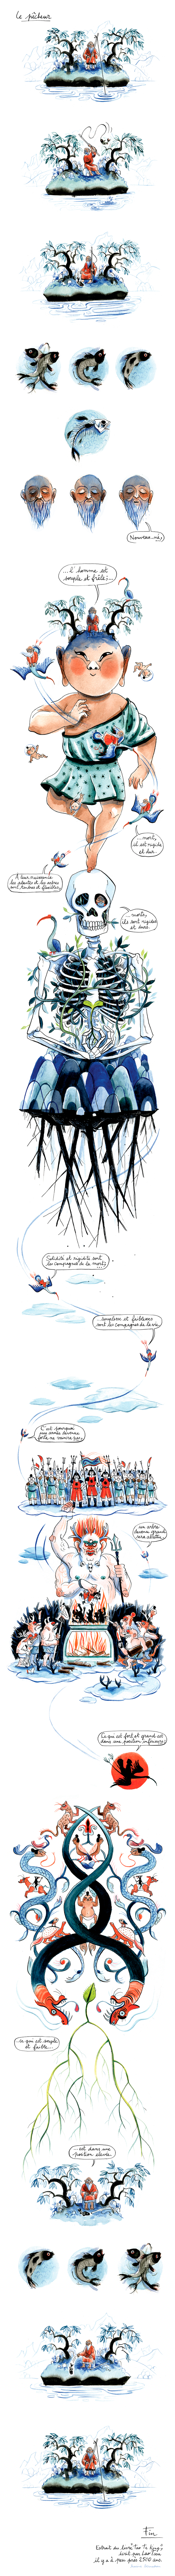 01-pecheur